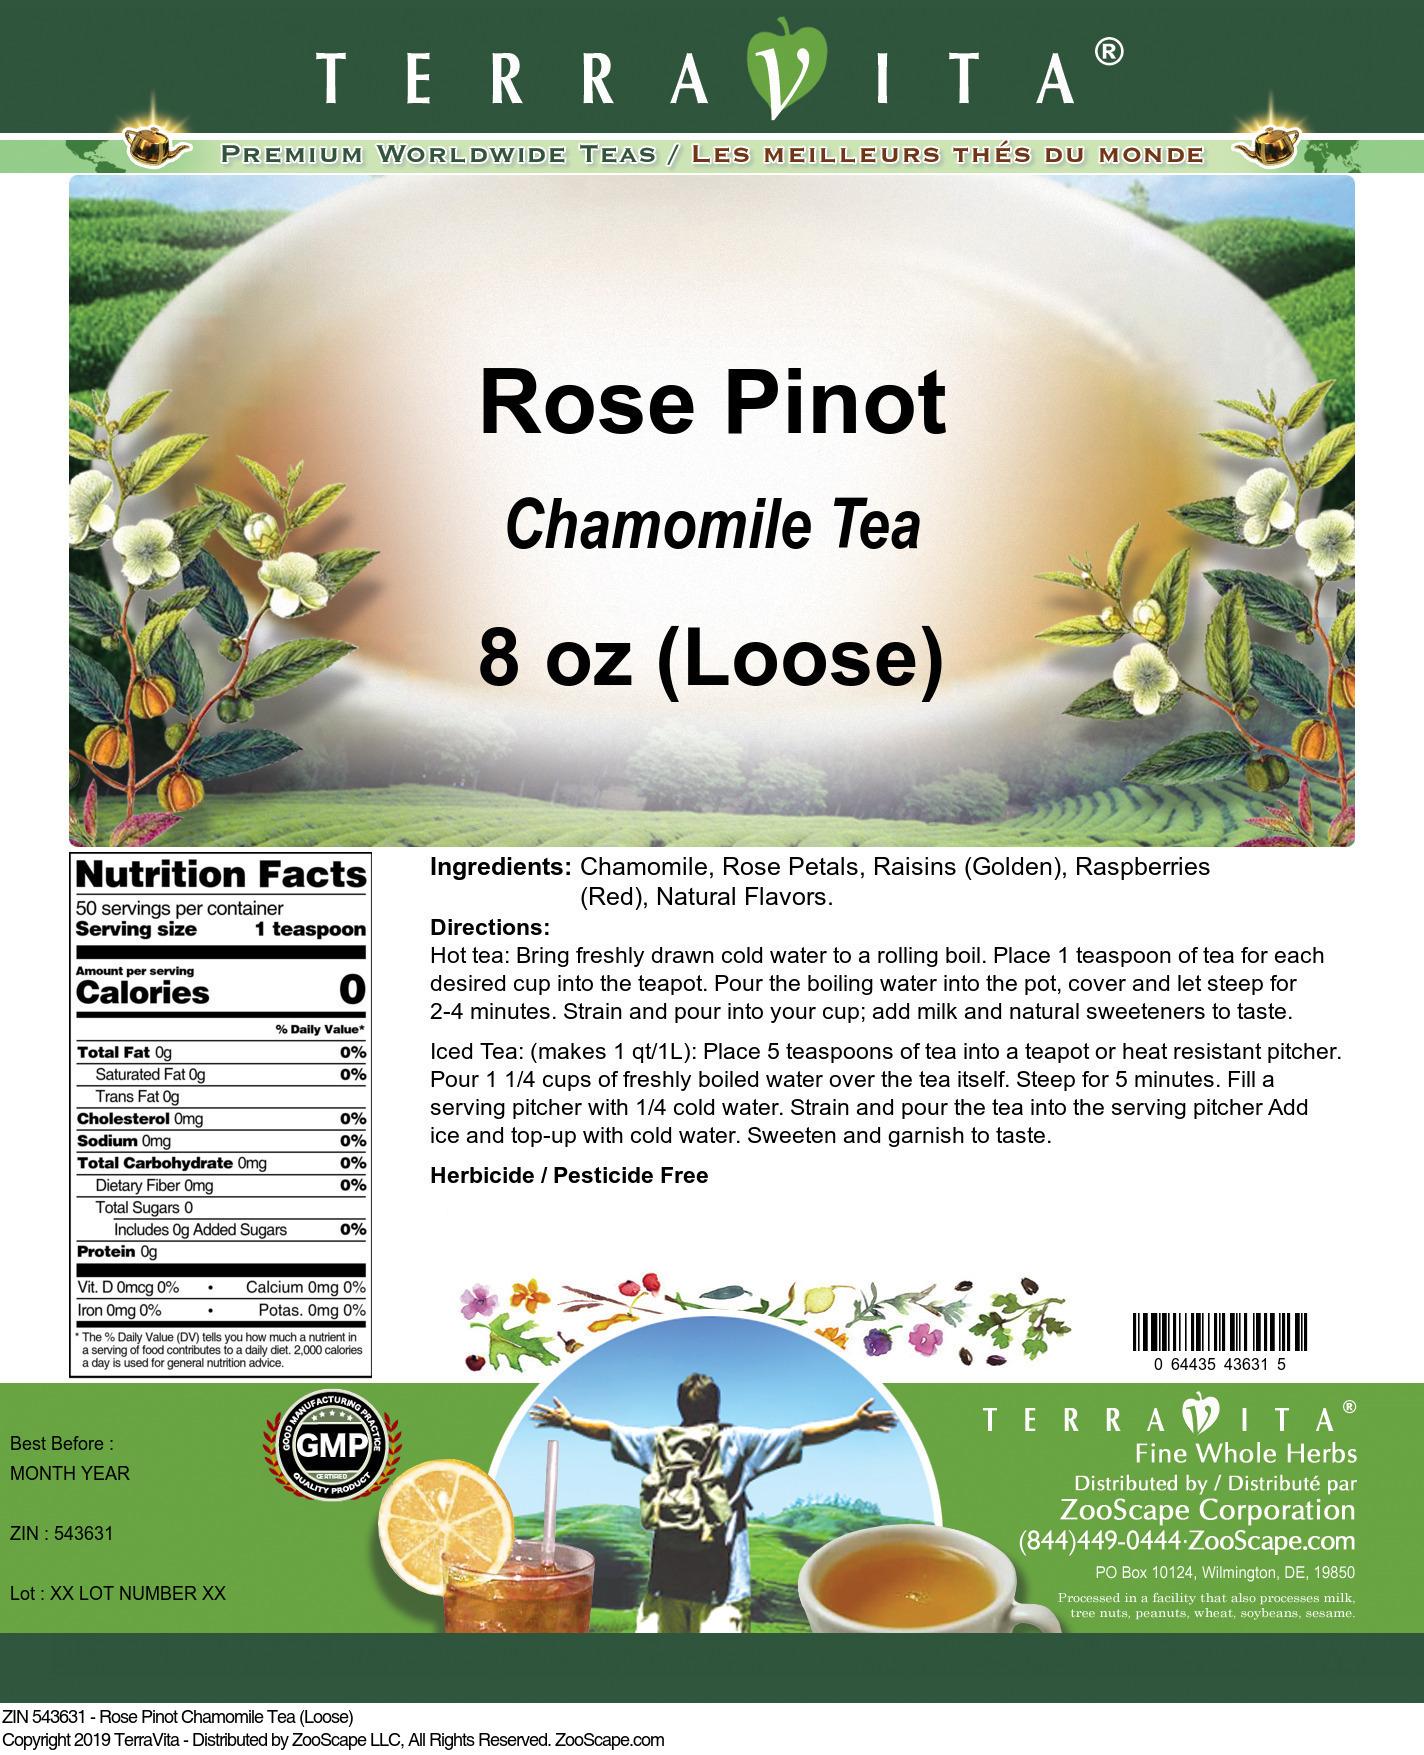 Rose Pinot Chamomile Tea